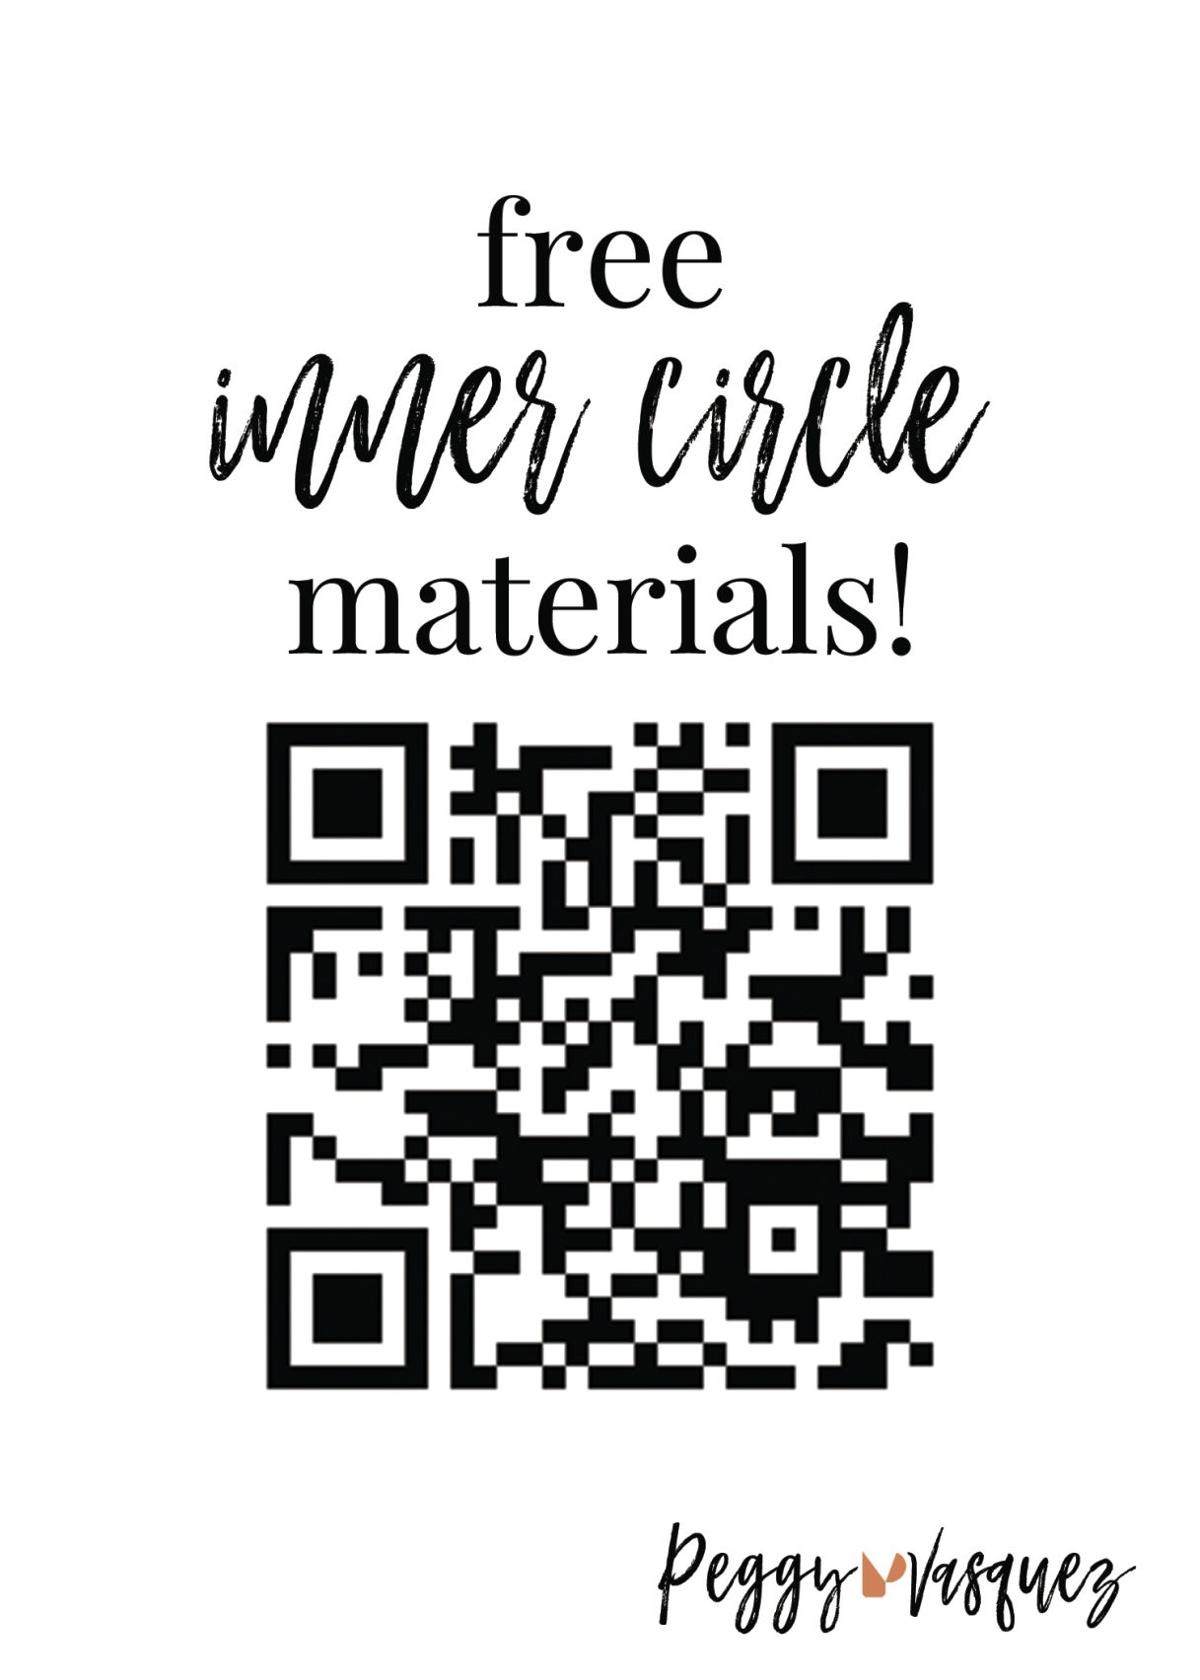 Free inner circle materials